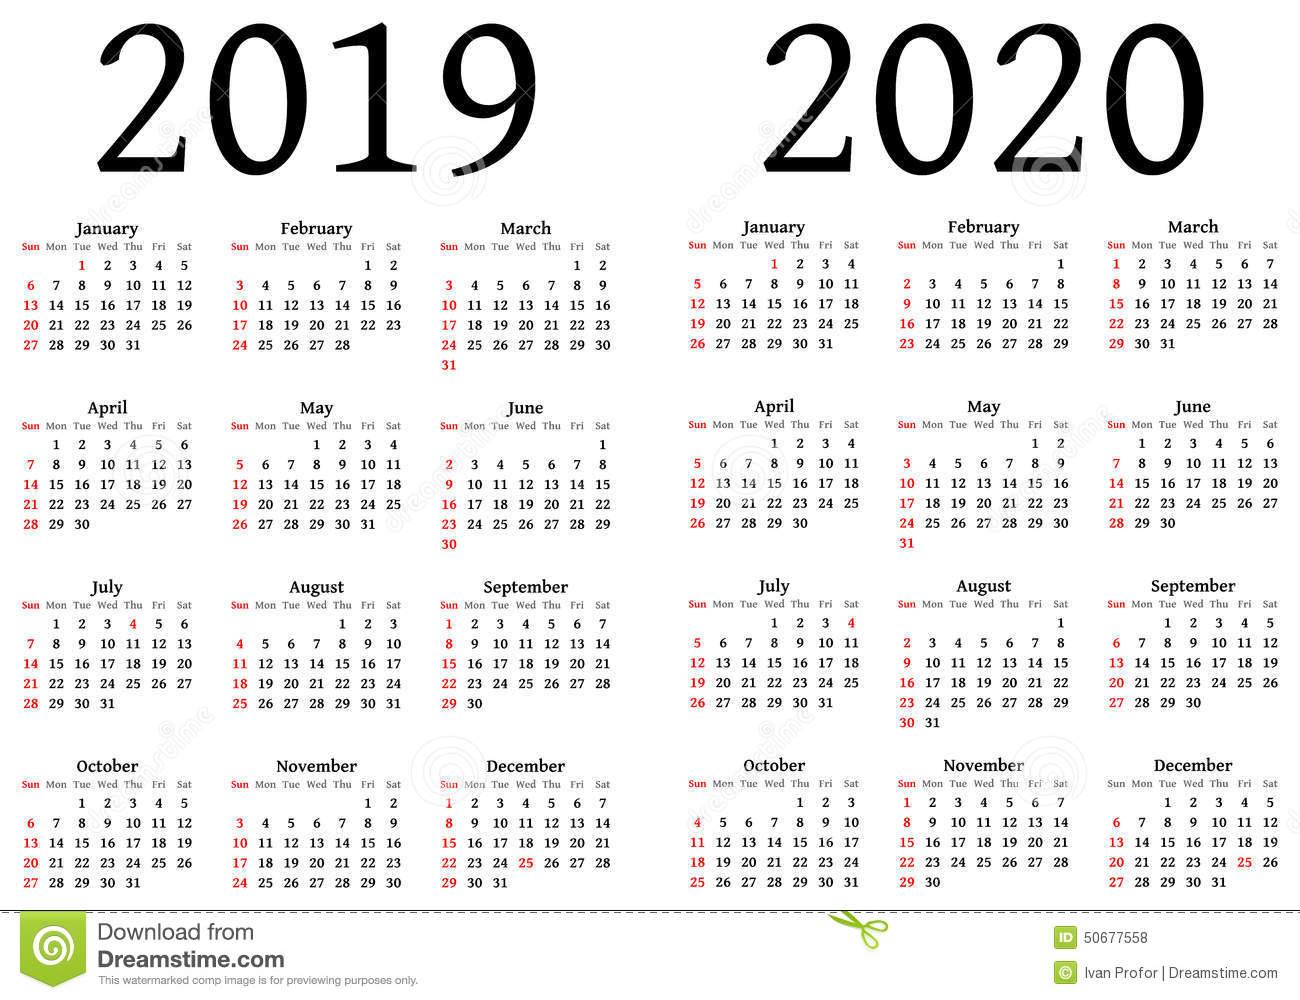 Printable Calendar For 2019 And 2020 | Printable Calendar 2019 throughout 2019-2020 Blank Calendar To Print